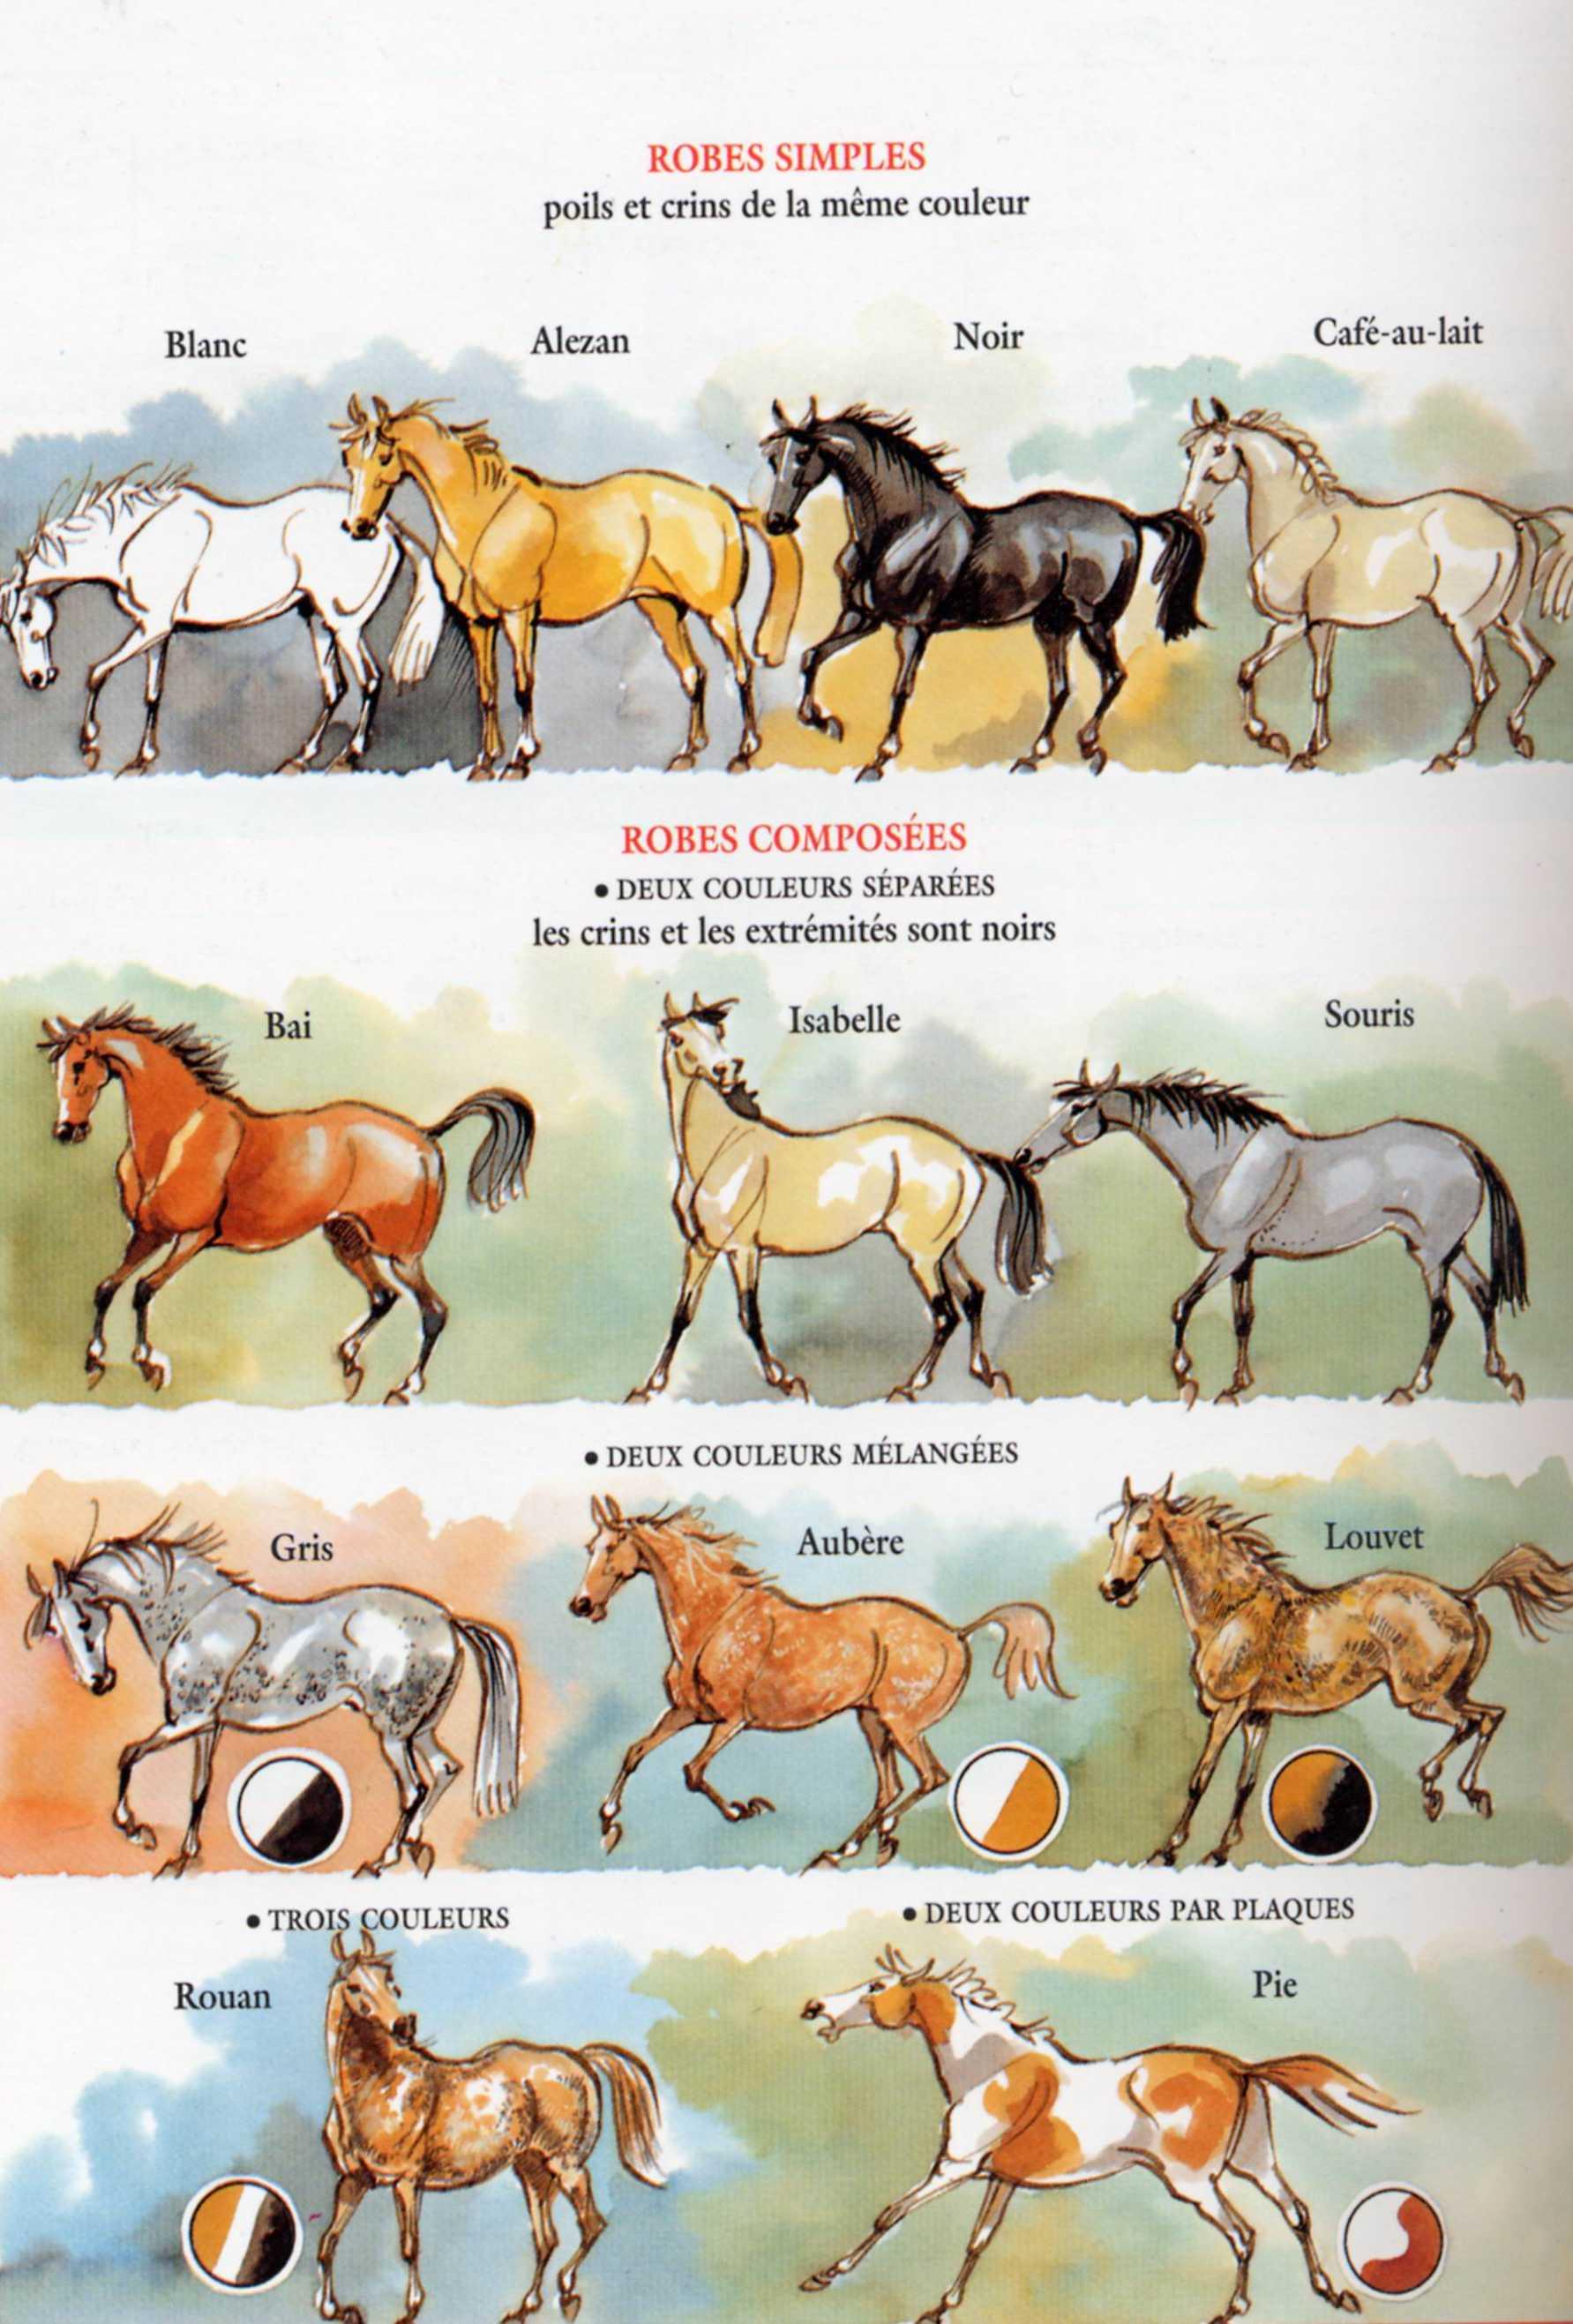 http://horses80.h.o.pic.centerblog.net/w8n0aa70.jpg